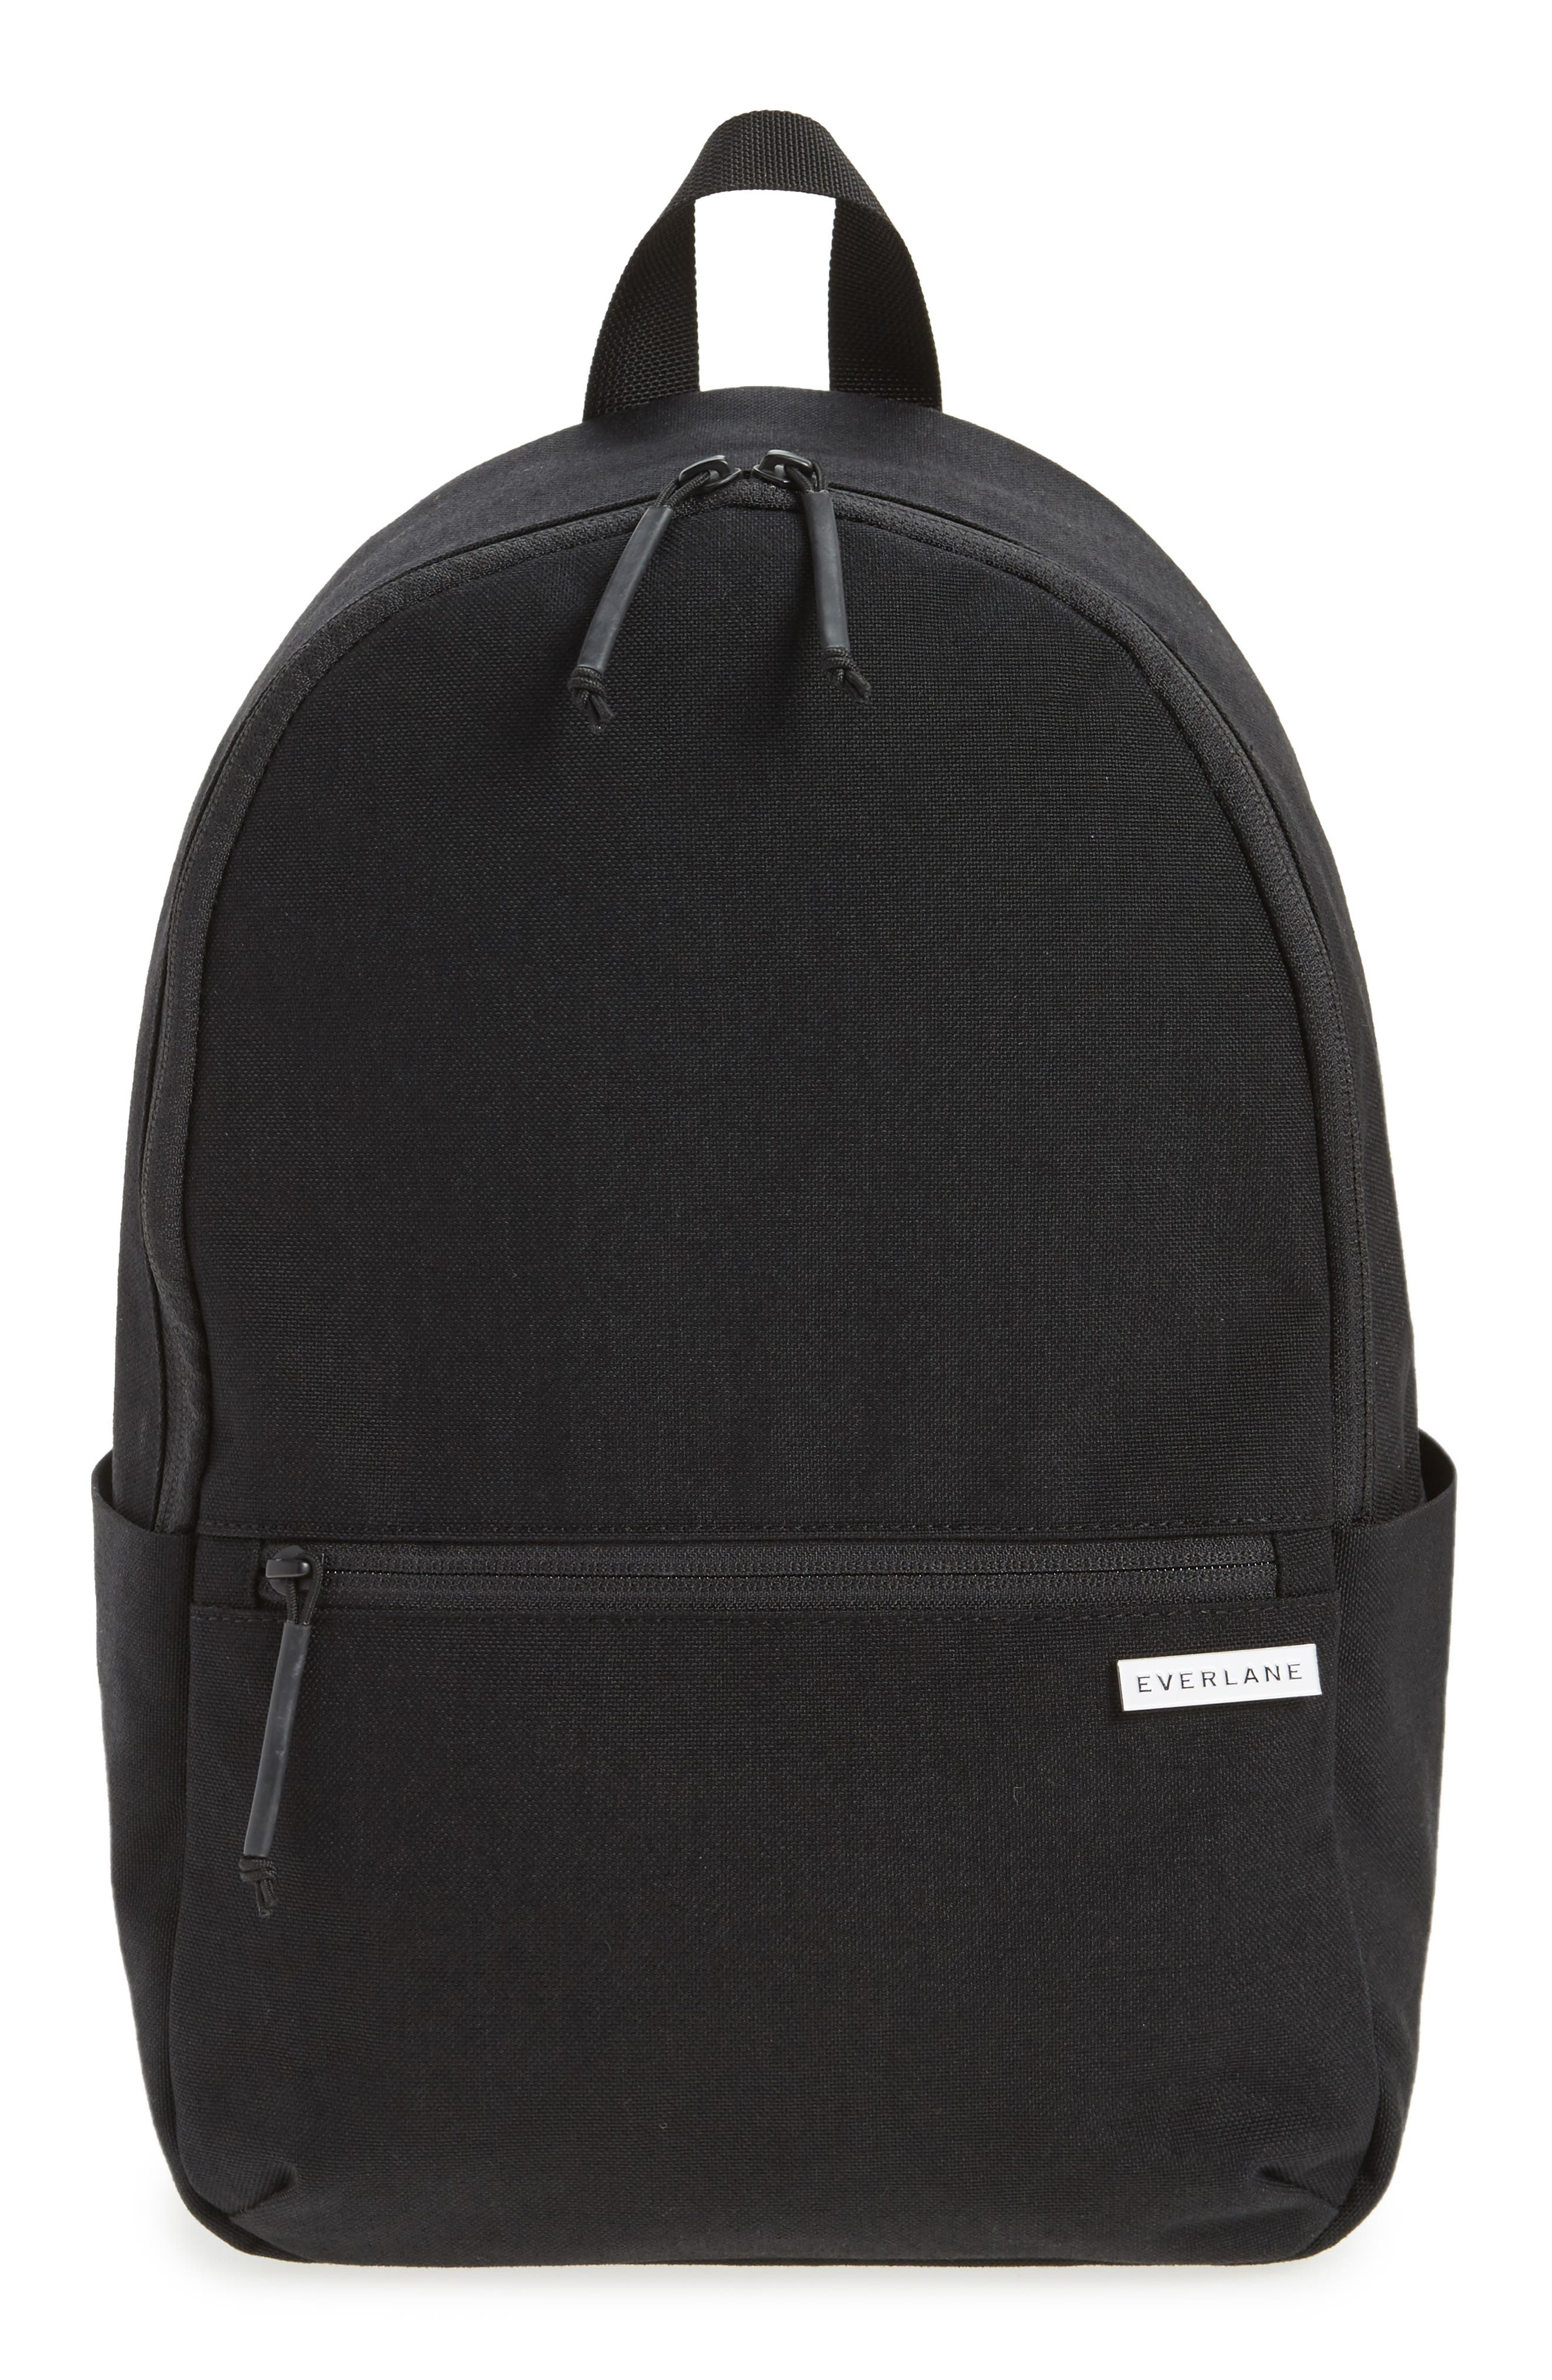 Main Image - Everlane The Small Street Nylon Zip Backpack